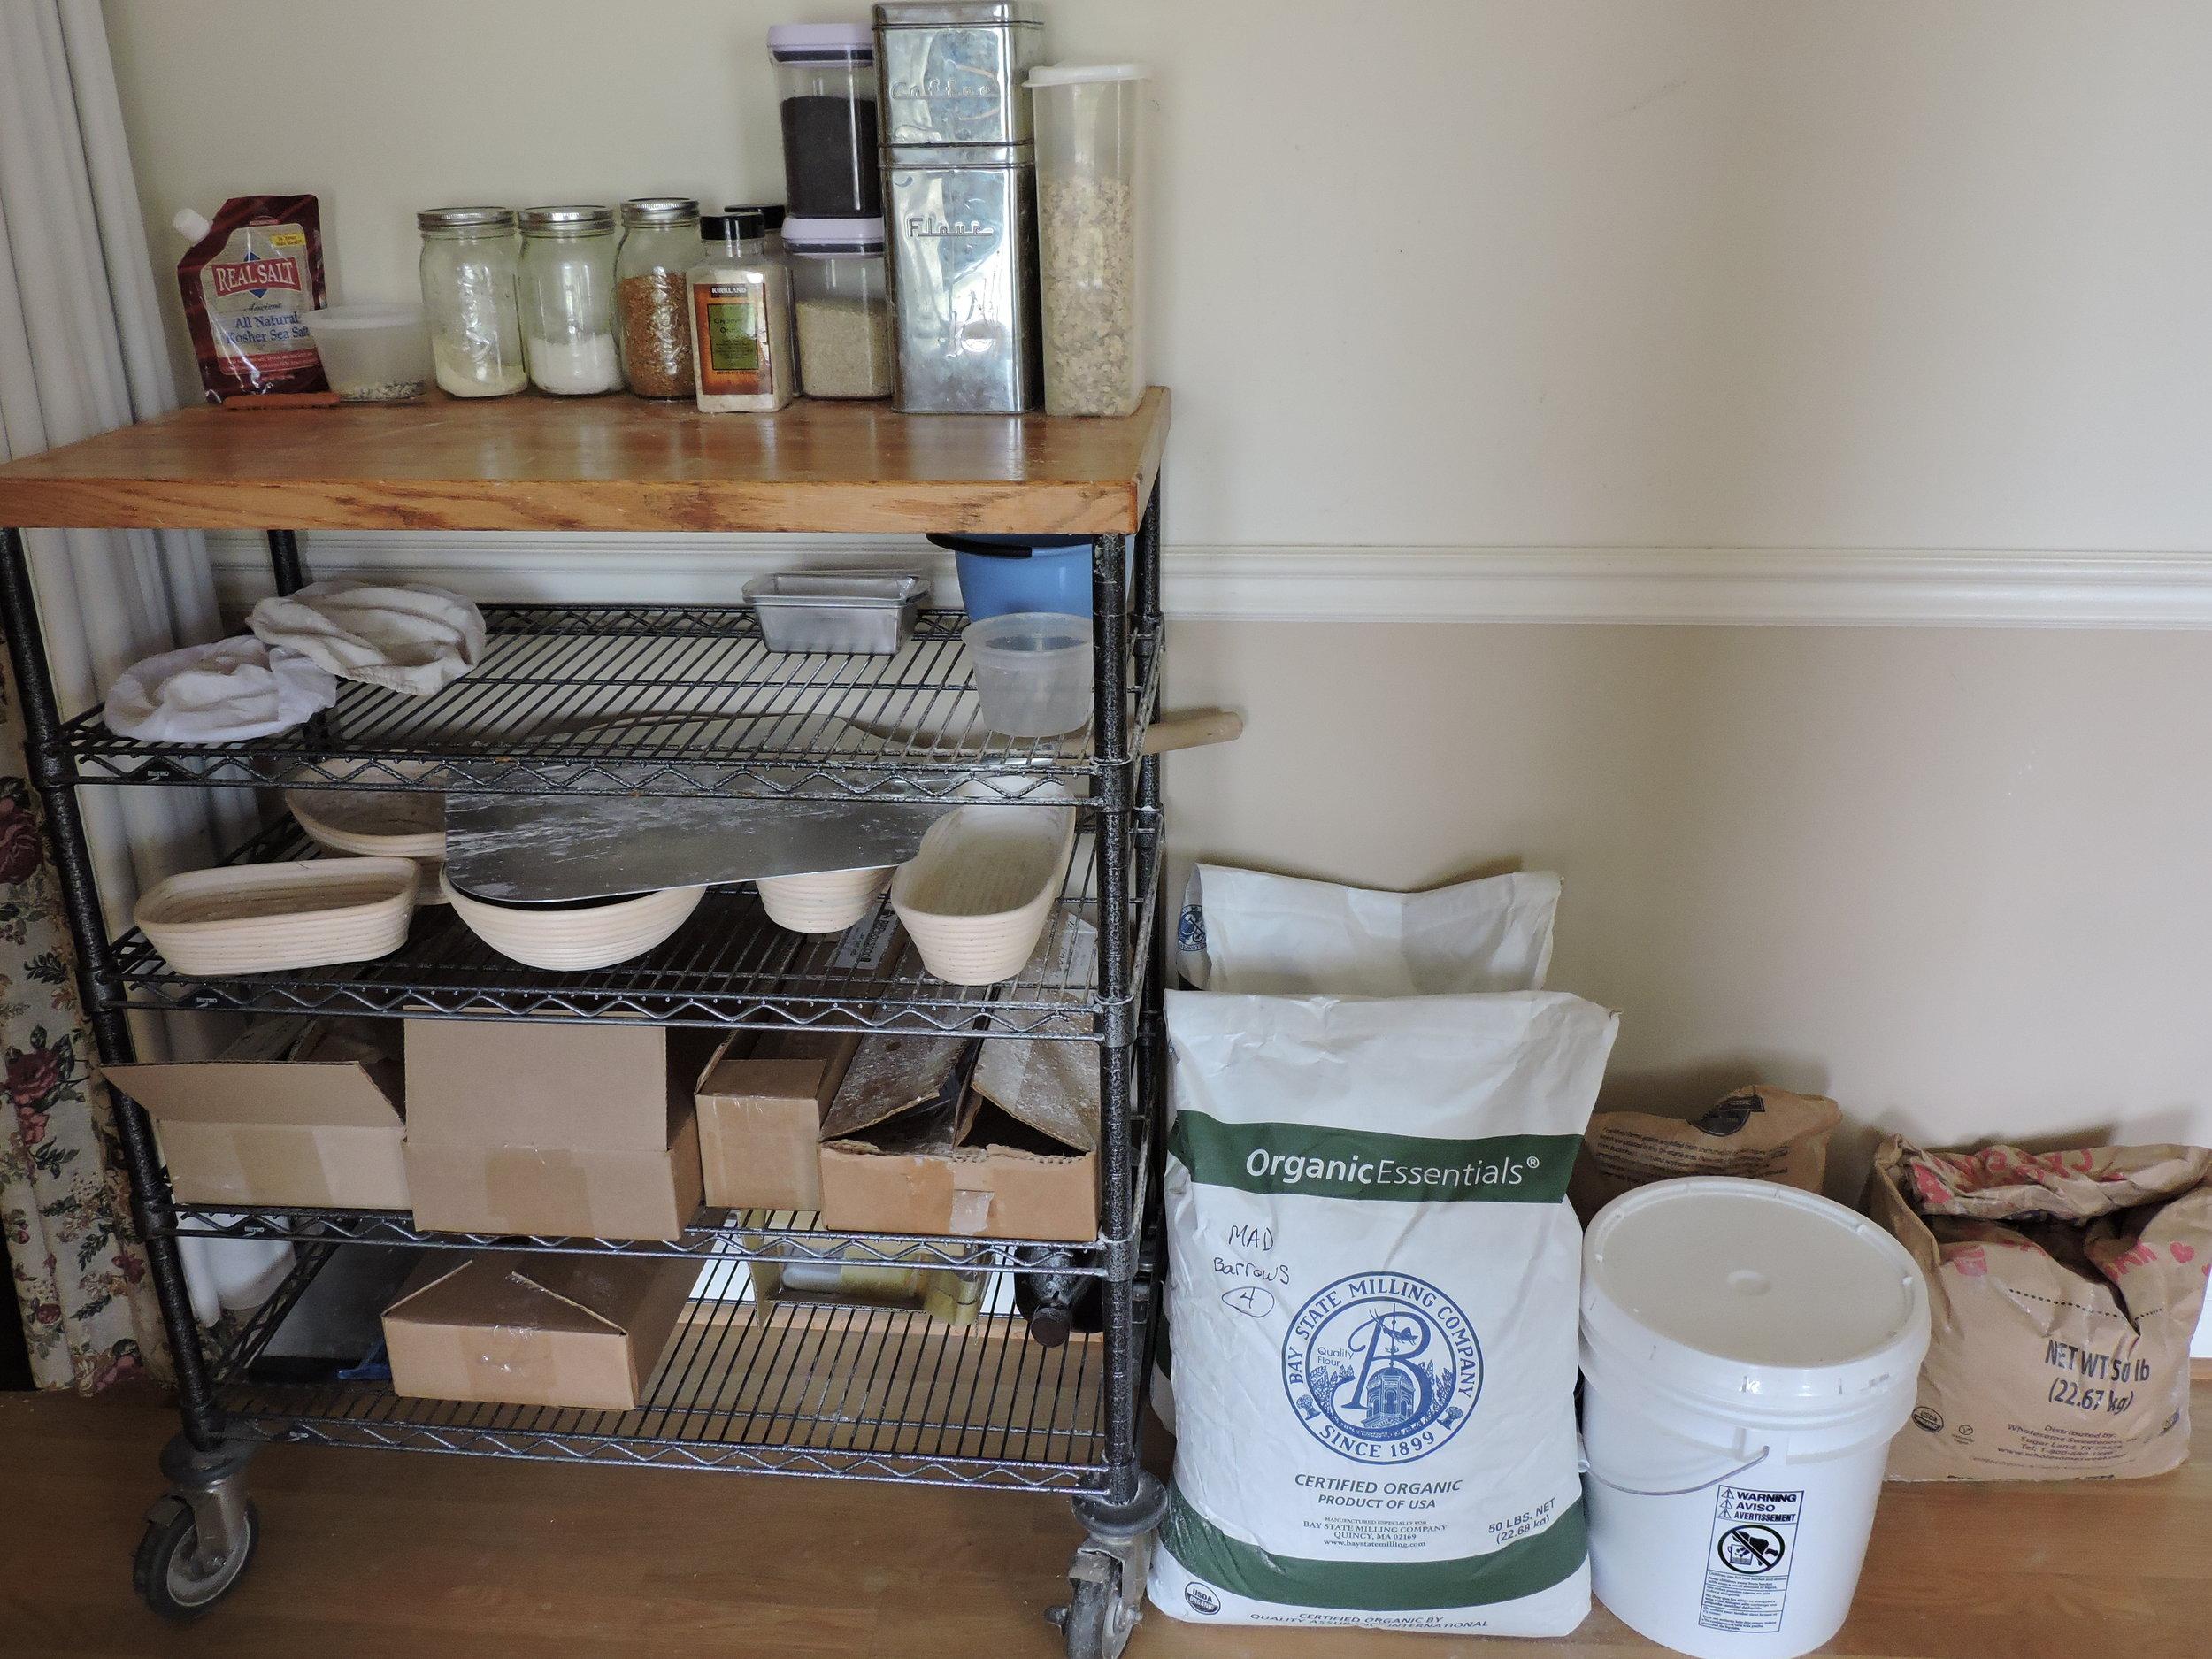 My baking supplies station